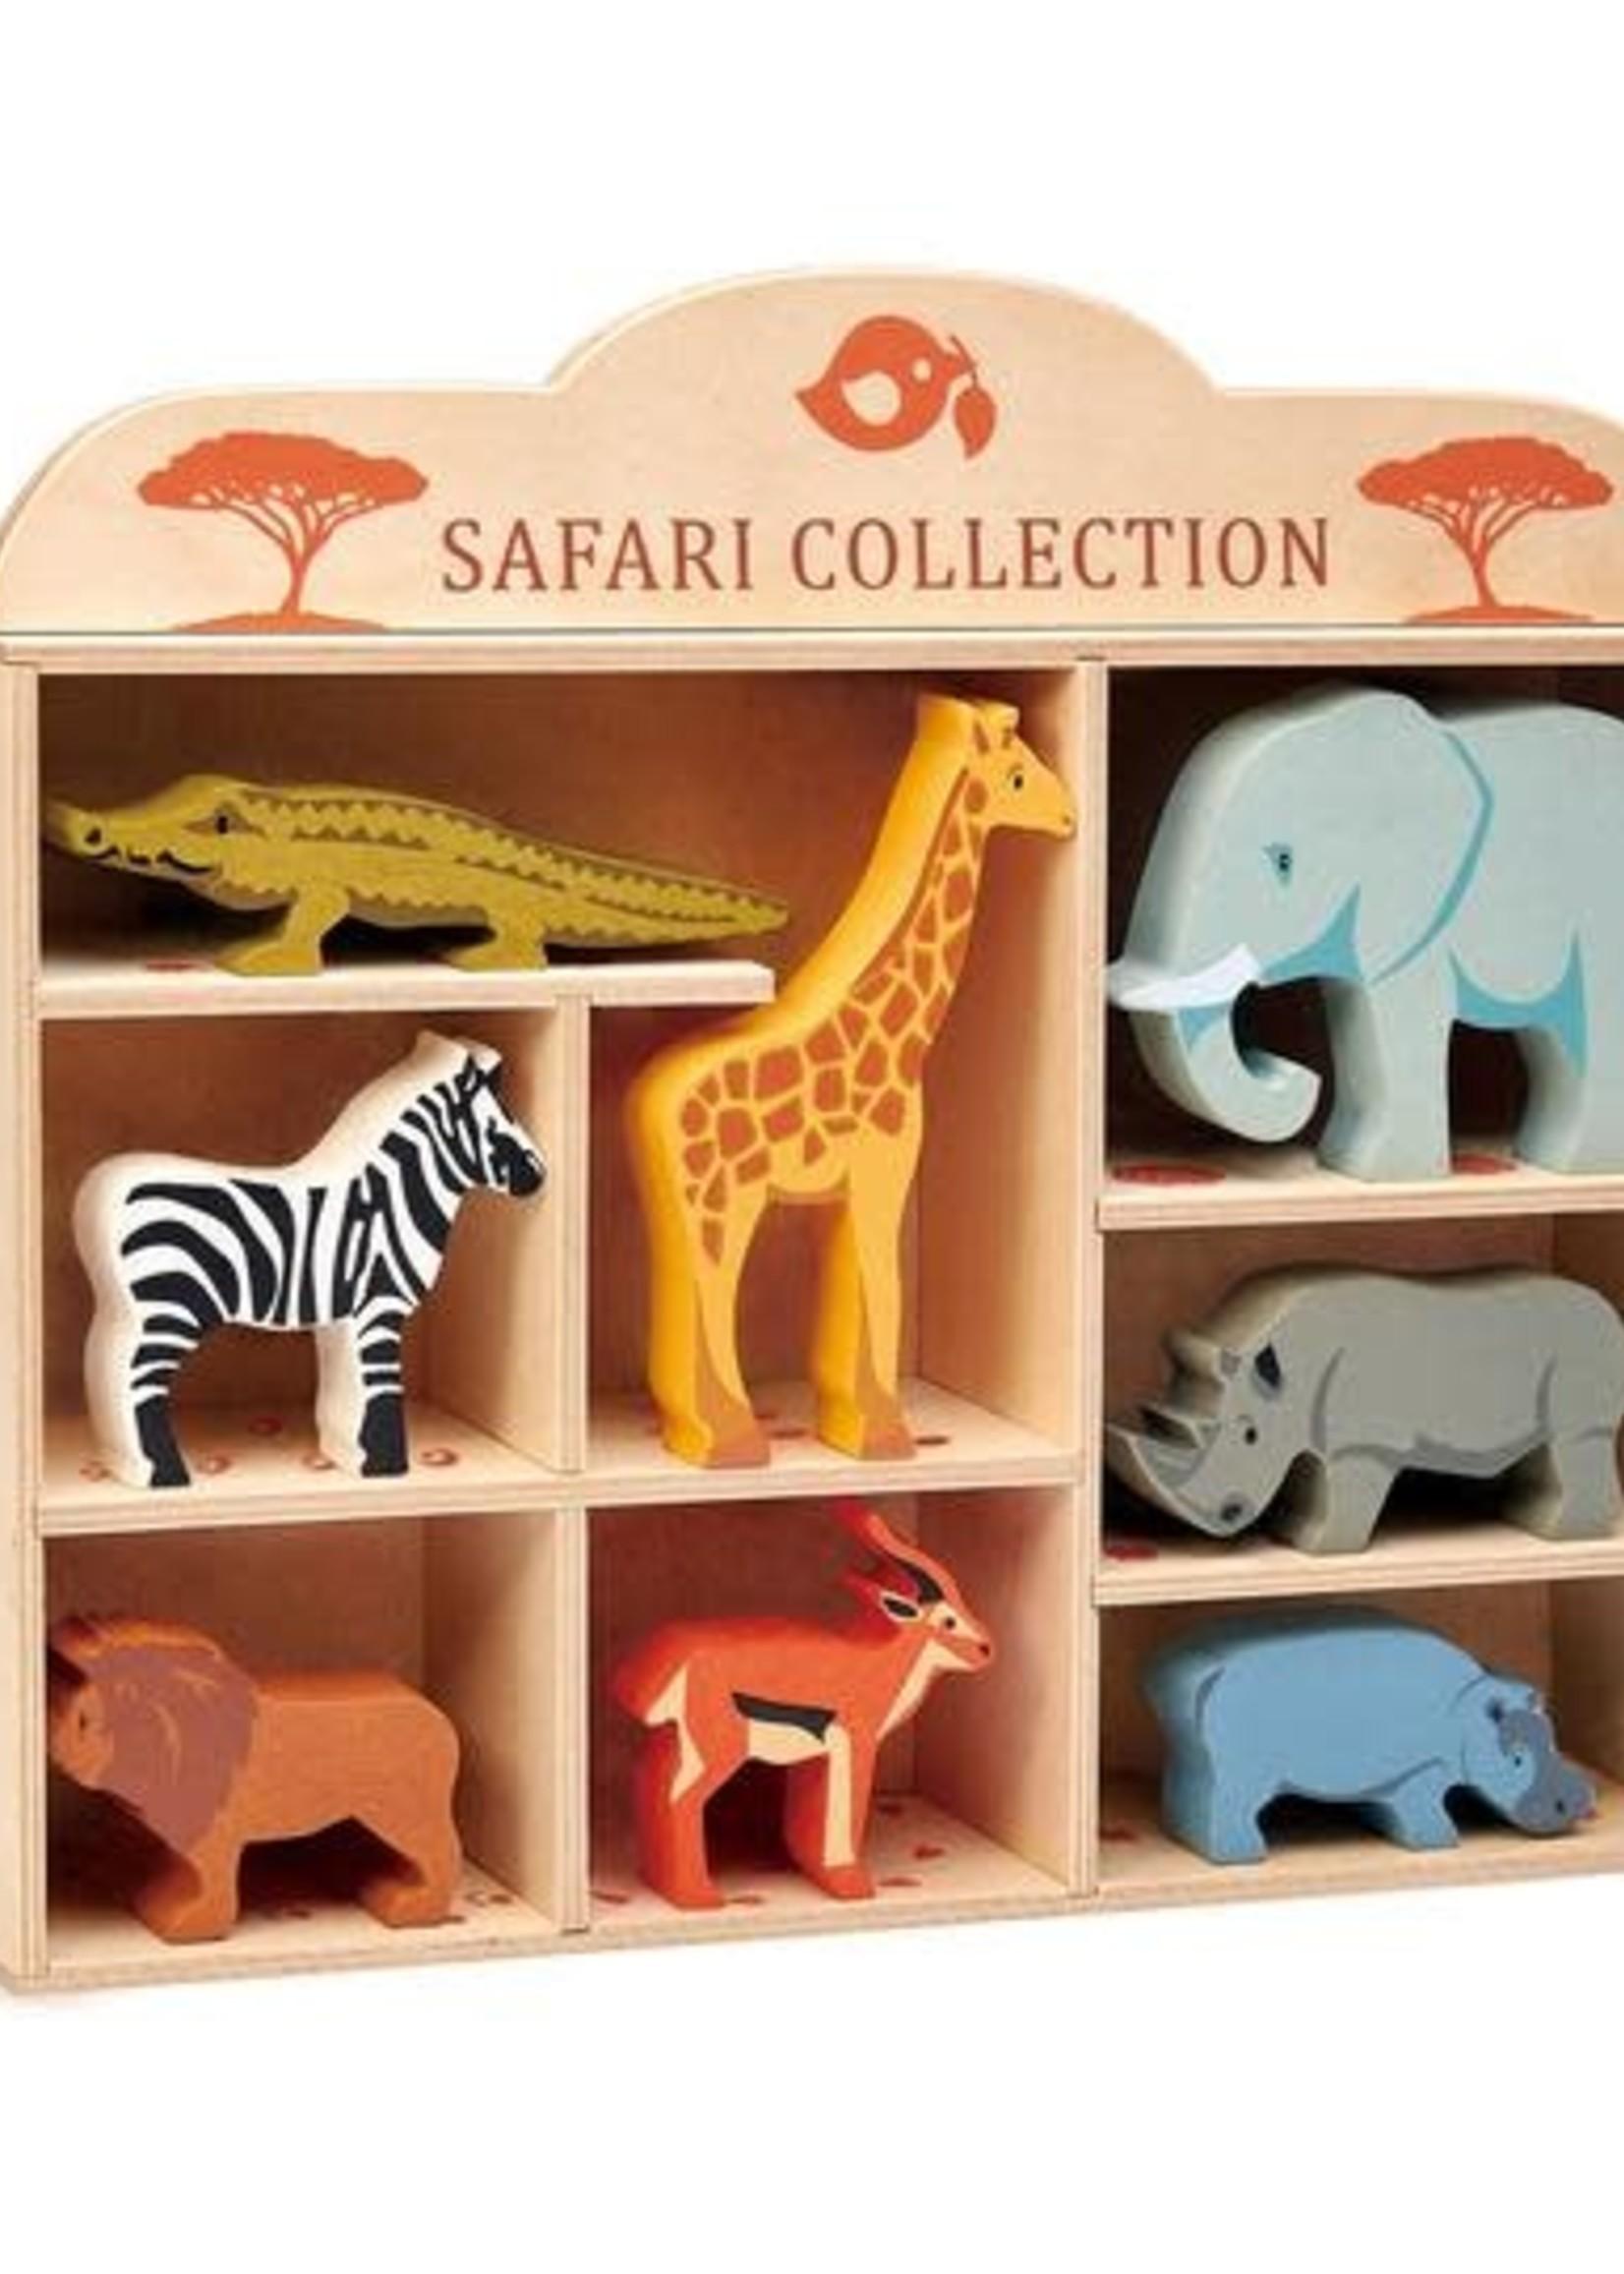 Tender Leaf Toys Set safaridieren